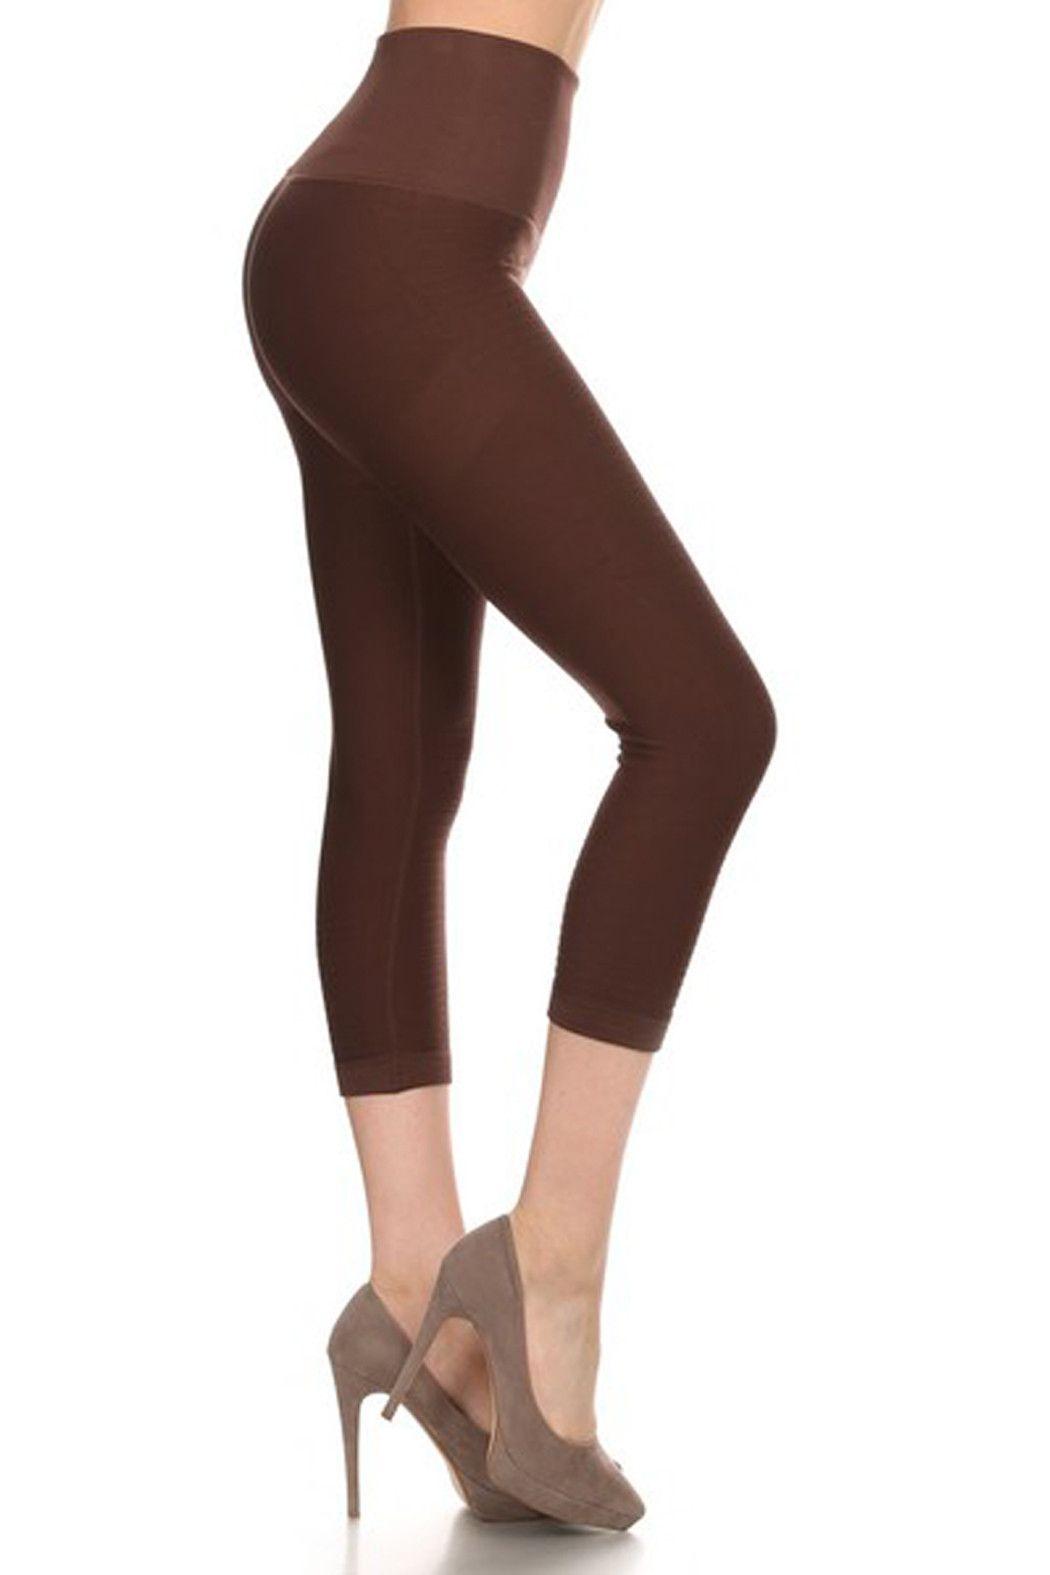 e90f41fd1 Performance Compression Active Wear Yoga Pants Legging Leggings Depot,  Women's Leggings, Capri Leggings,